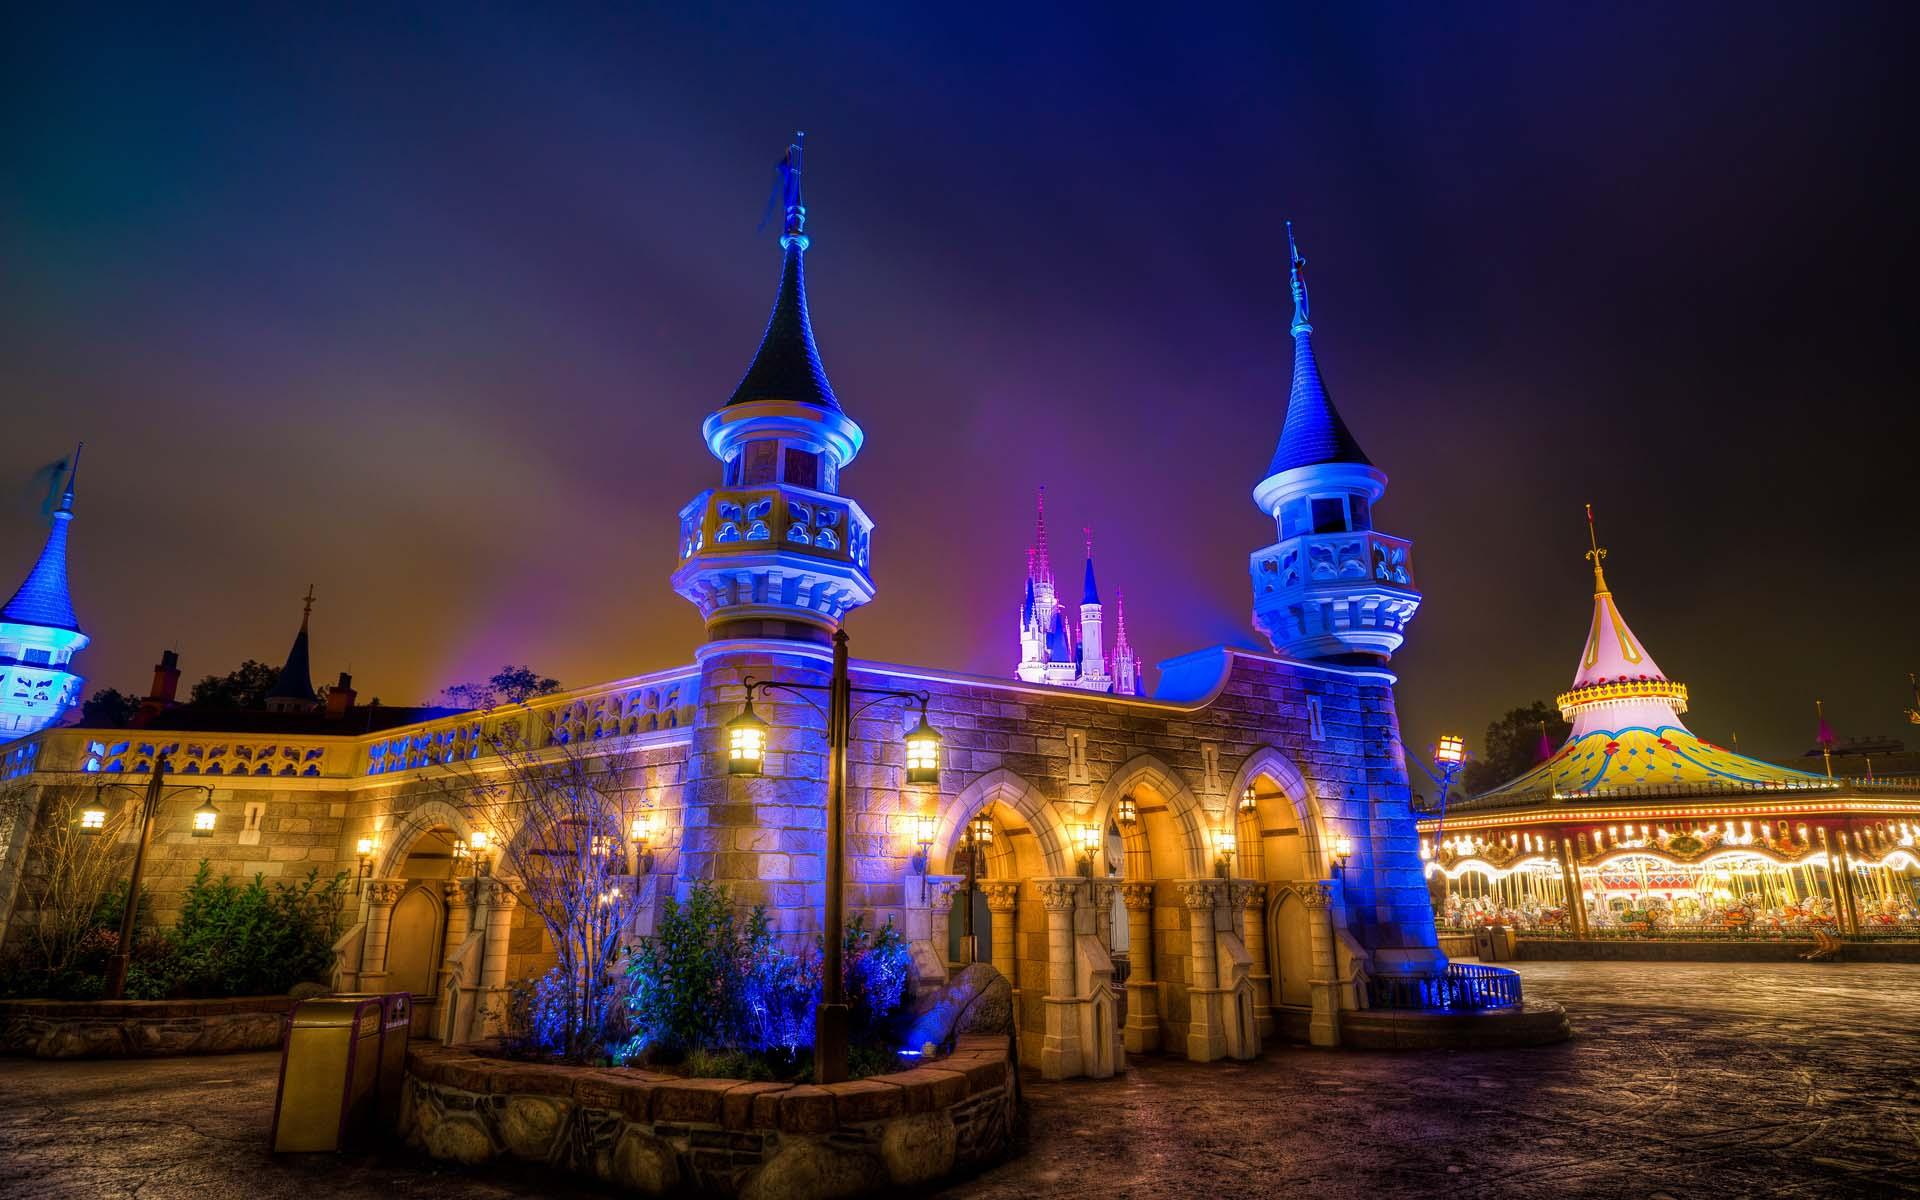 Fantastic Wallpaper Macbook Disneyland - disney-world-wallpapers-9  Best Photo Reference_931622.jpg